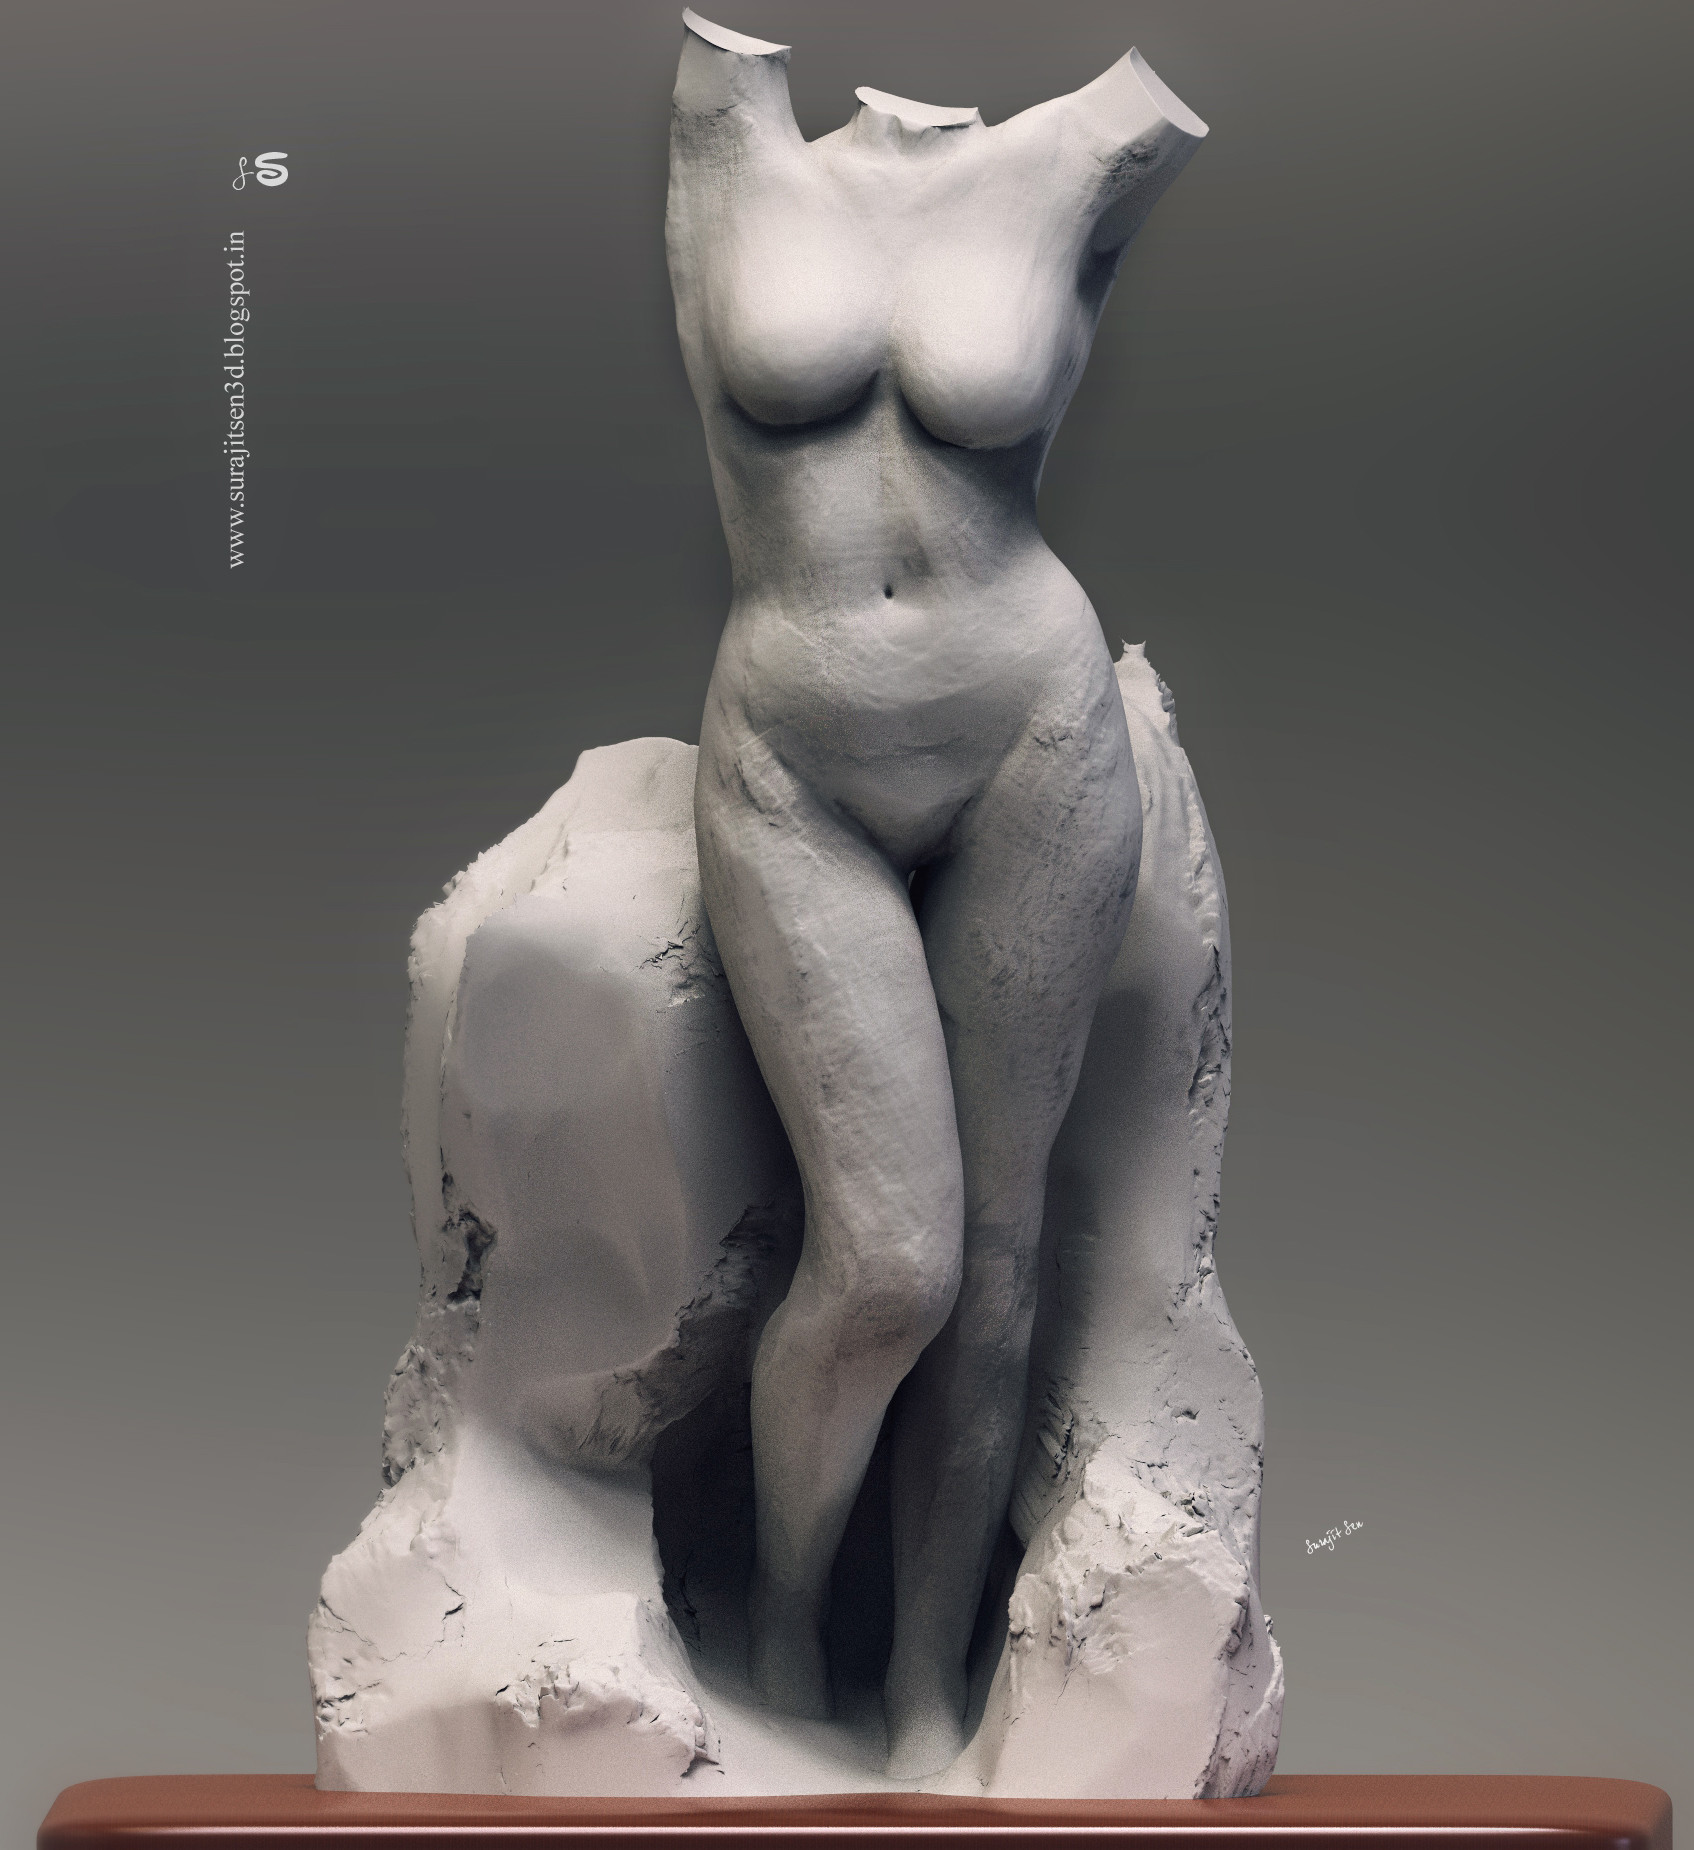 Surajit sen lady digital sculpt surajitsen 11122018